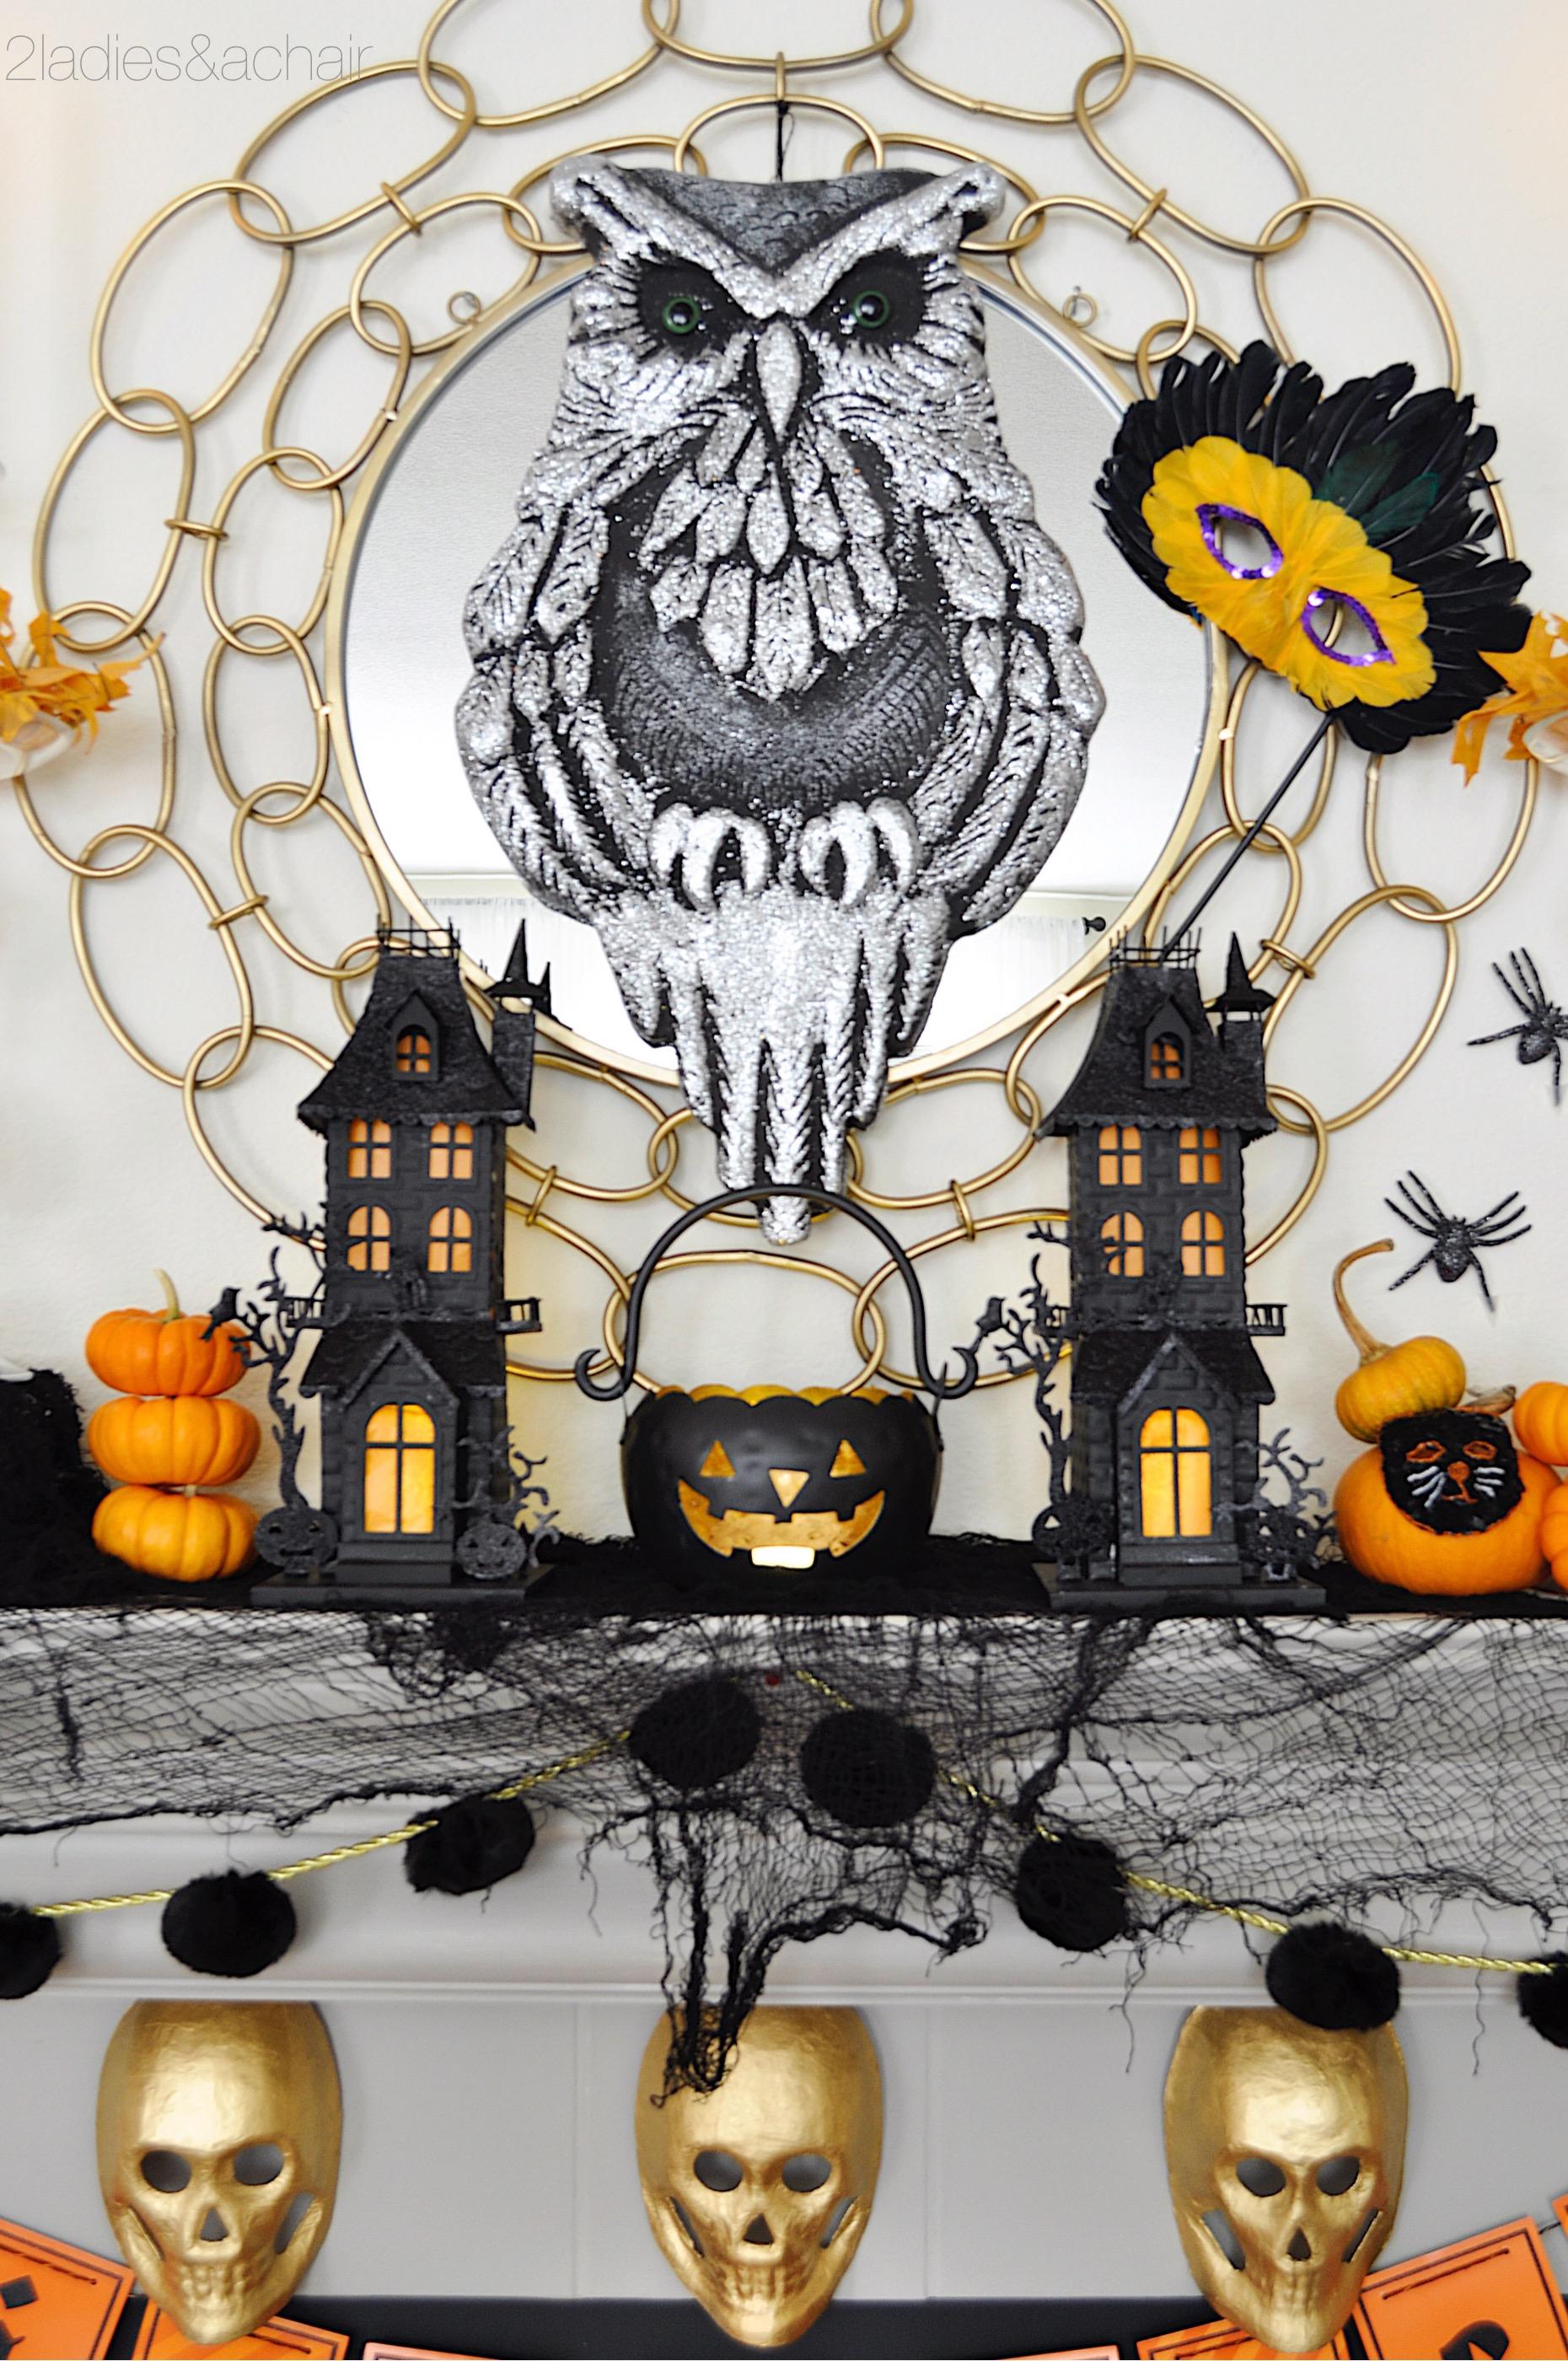 halloween mantel decorations IMG_8212.JPG